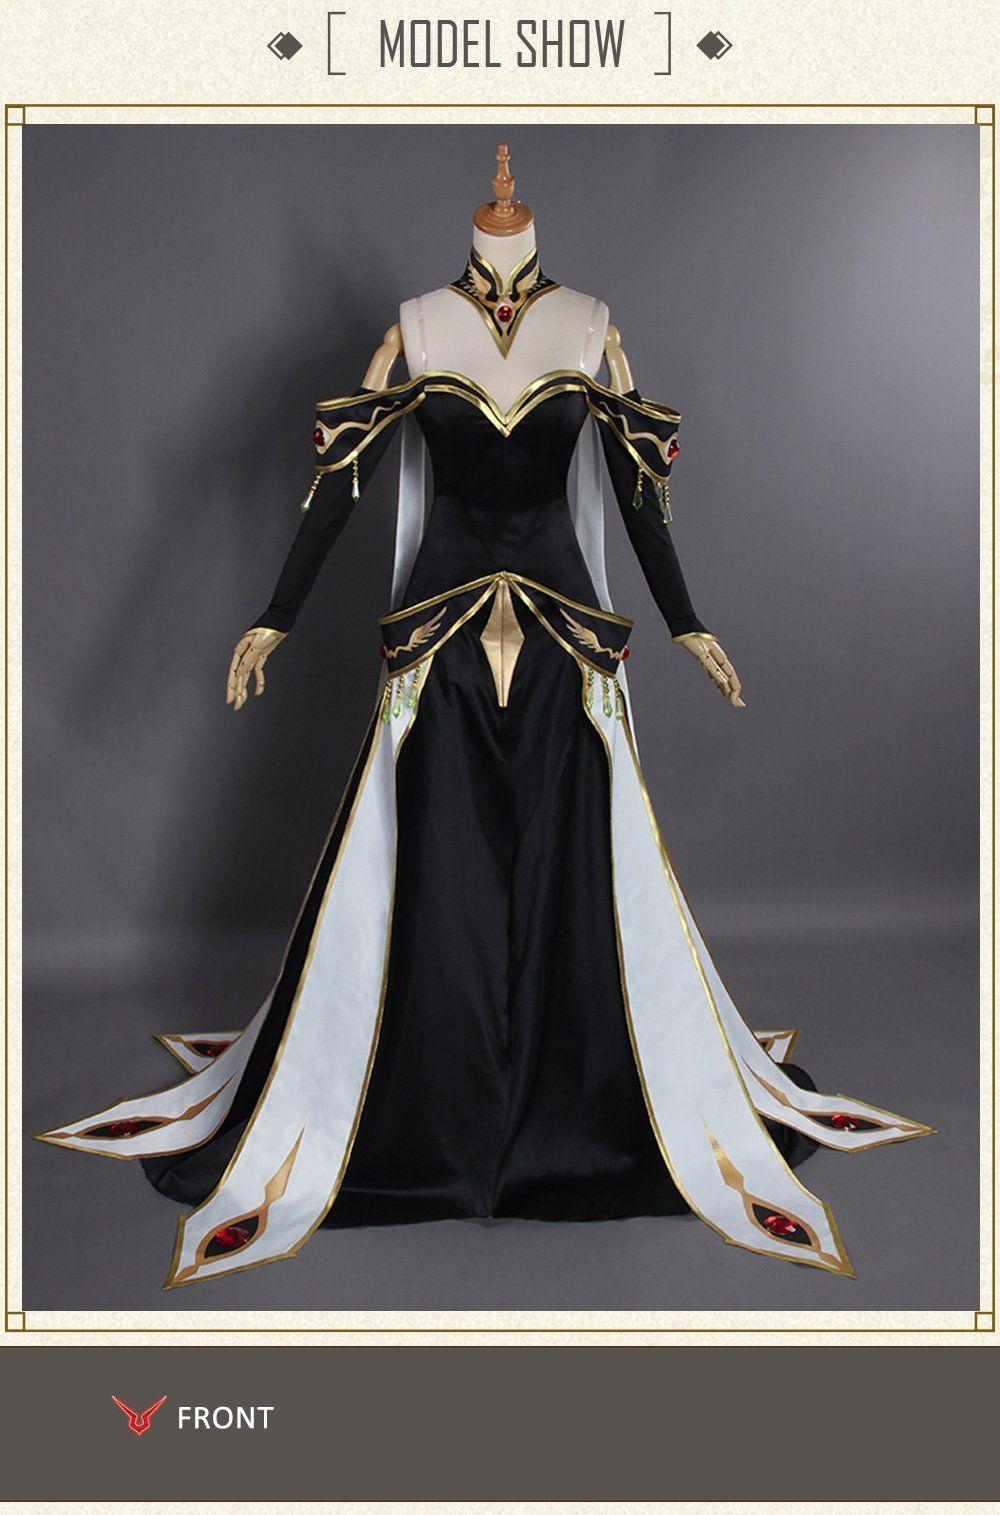 UWOWO CODE GEASS Lelouch of the Rebellion C.C Cosplay Empress Queen Costume New